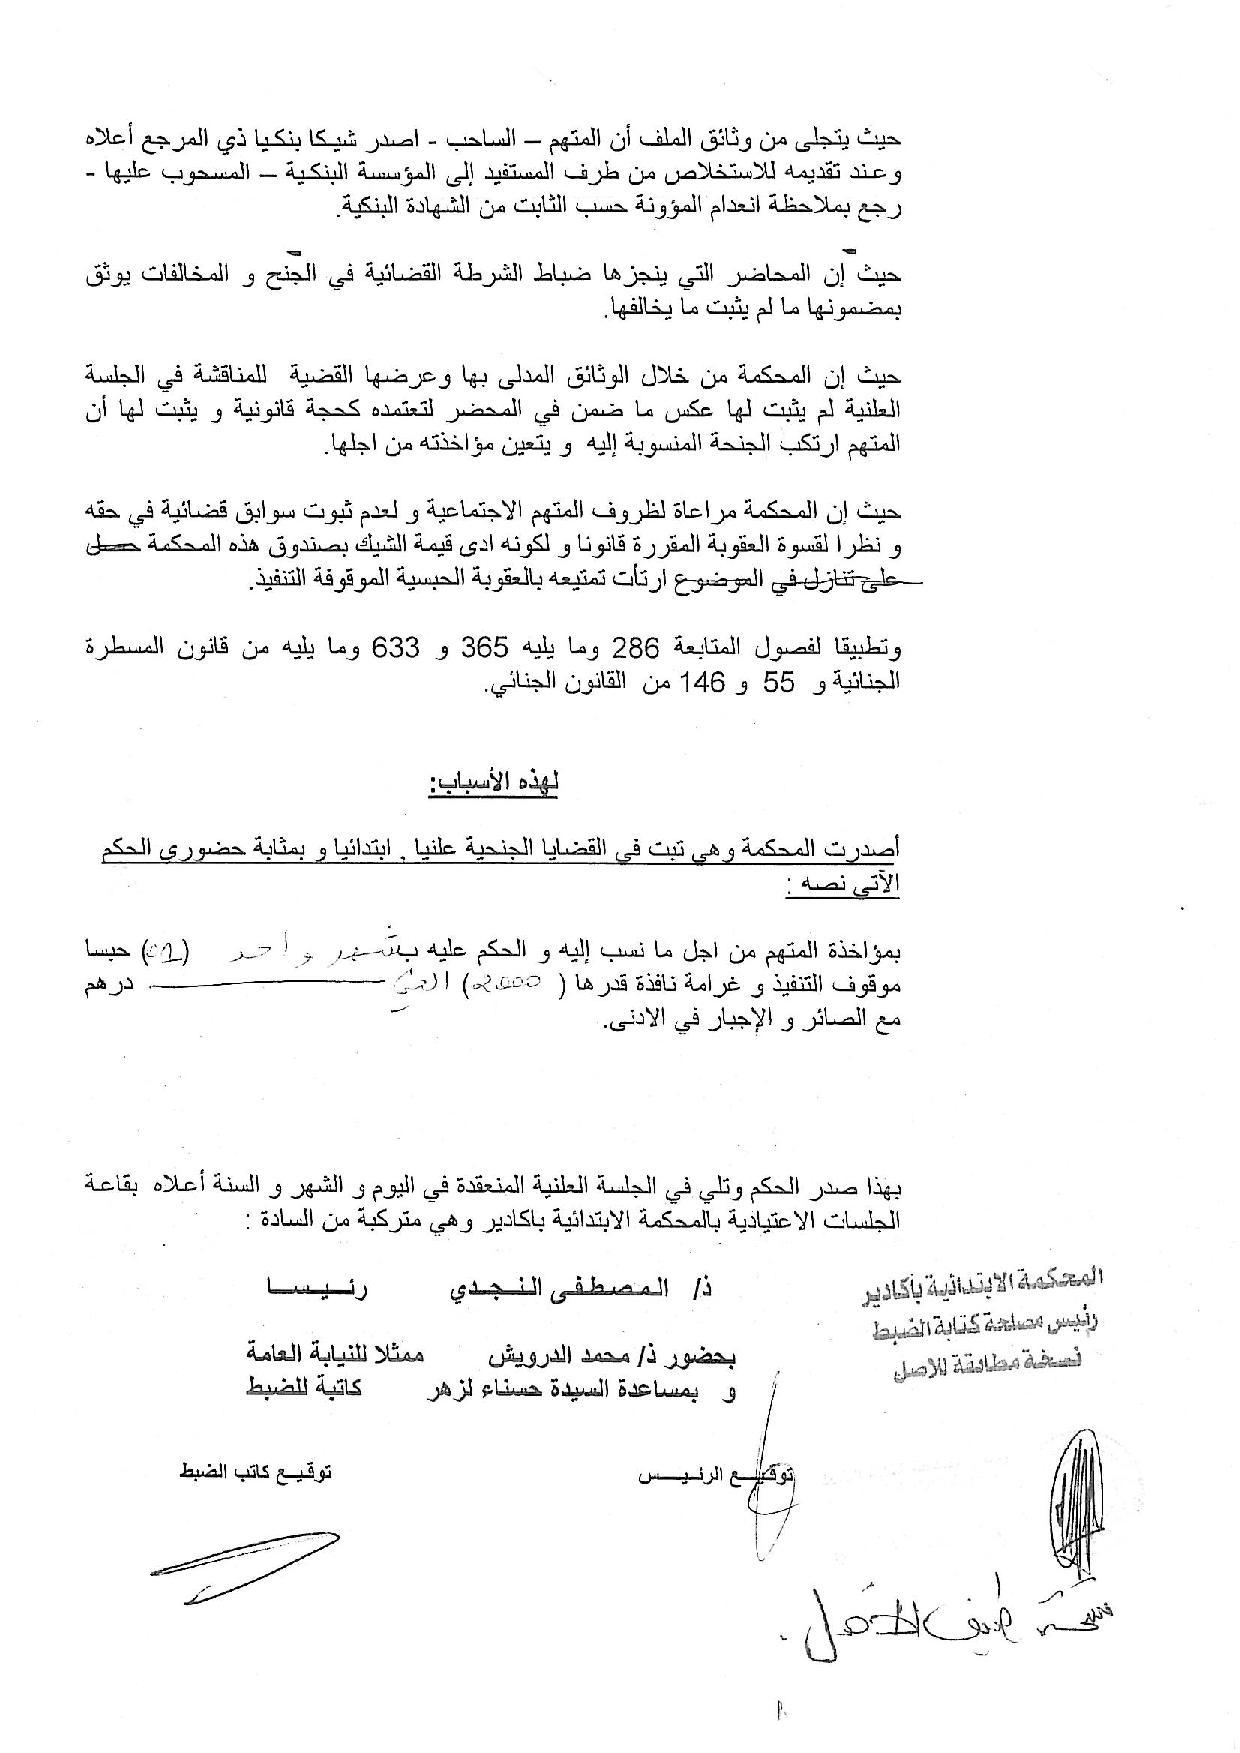 skmbt_c45016110717210-page-002